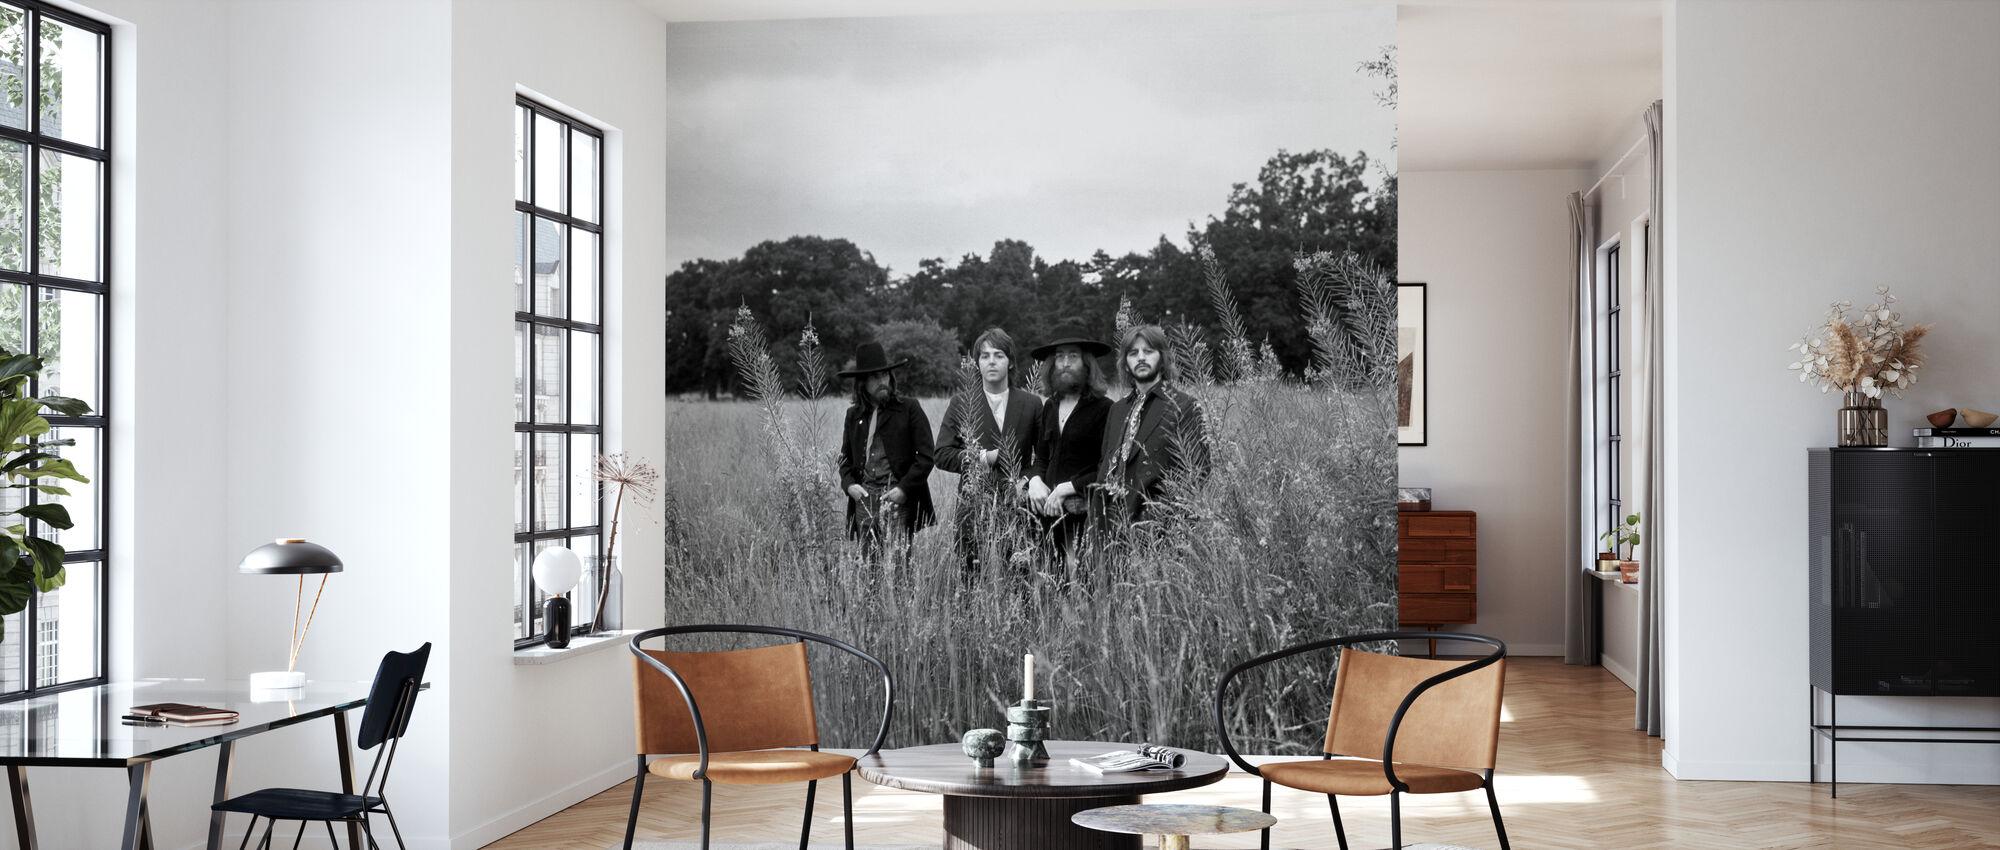 Beatles - Field BW - Wallpaper - Living Room